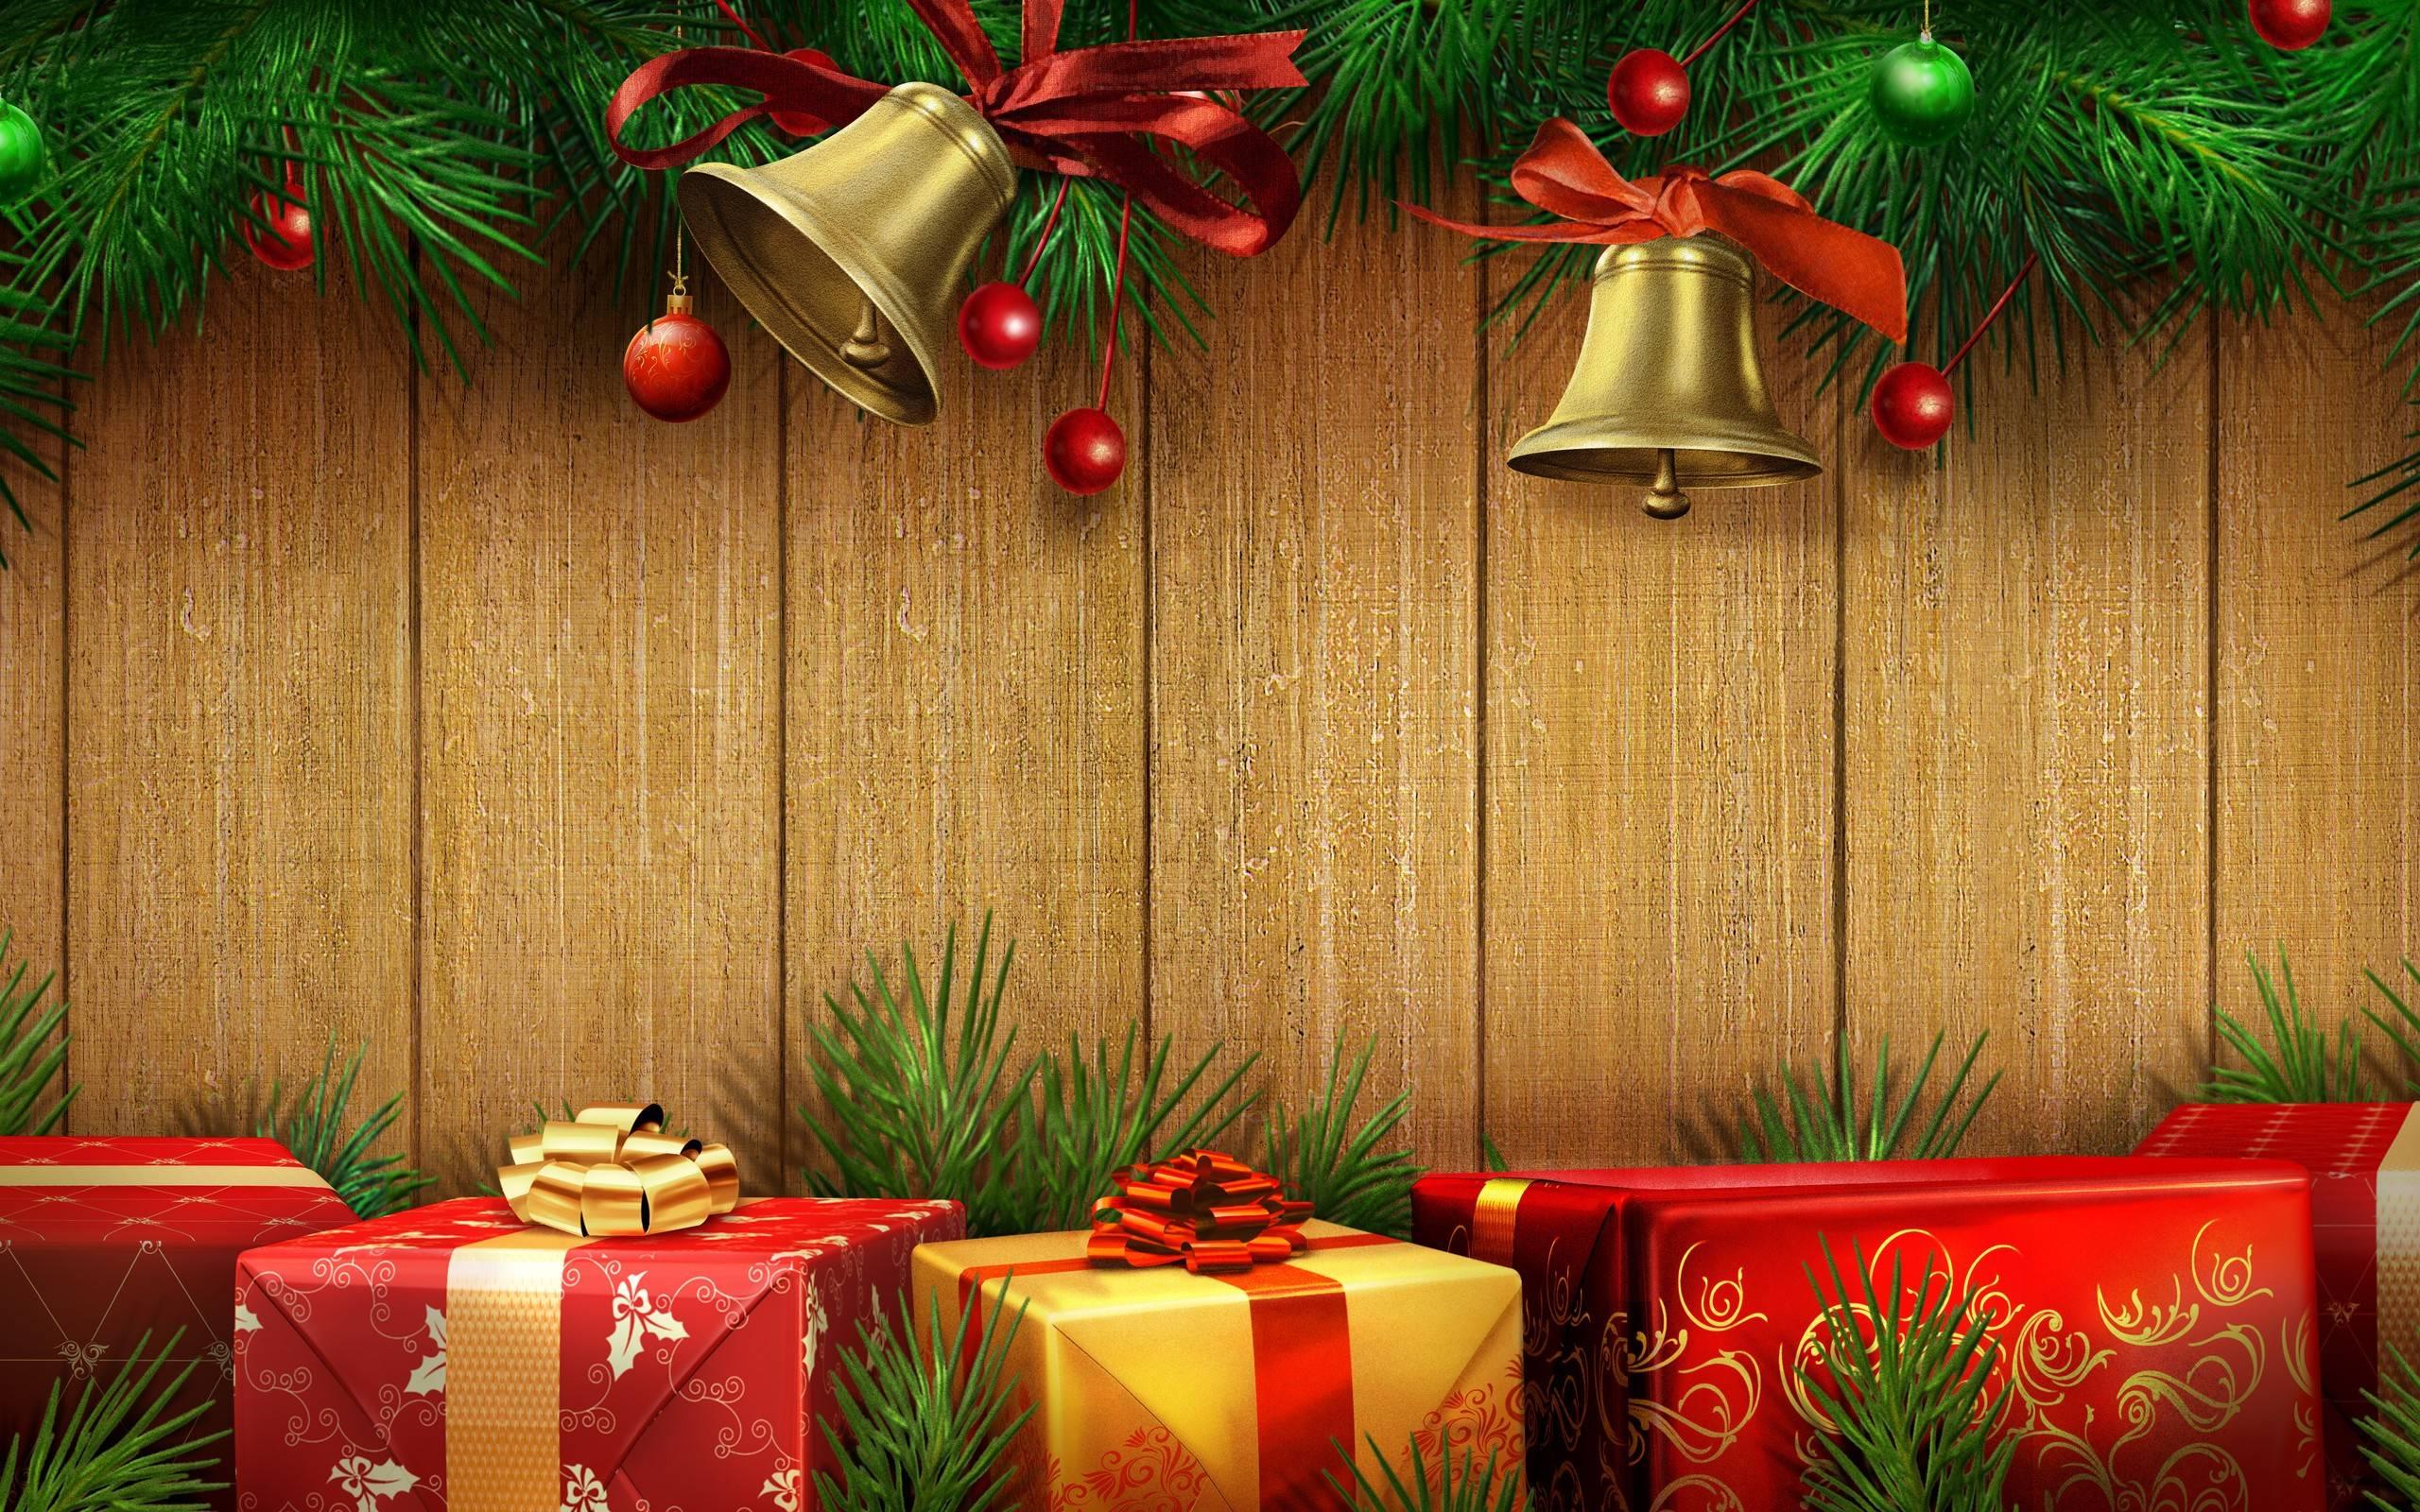 Christmas Gift Backgrounds 2560x1600